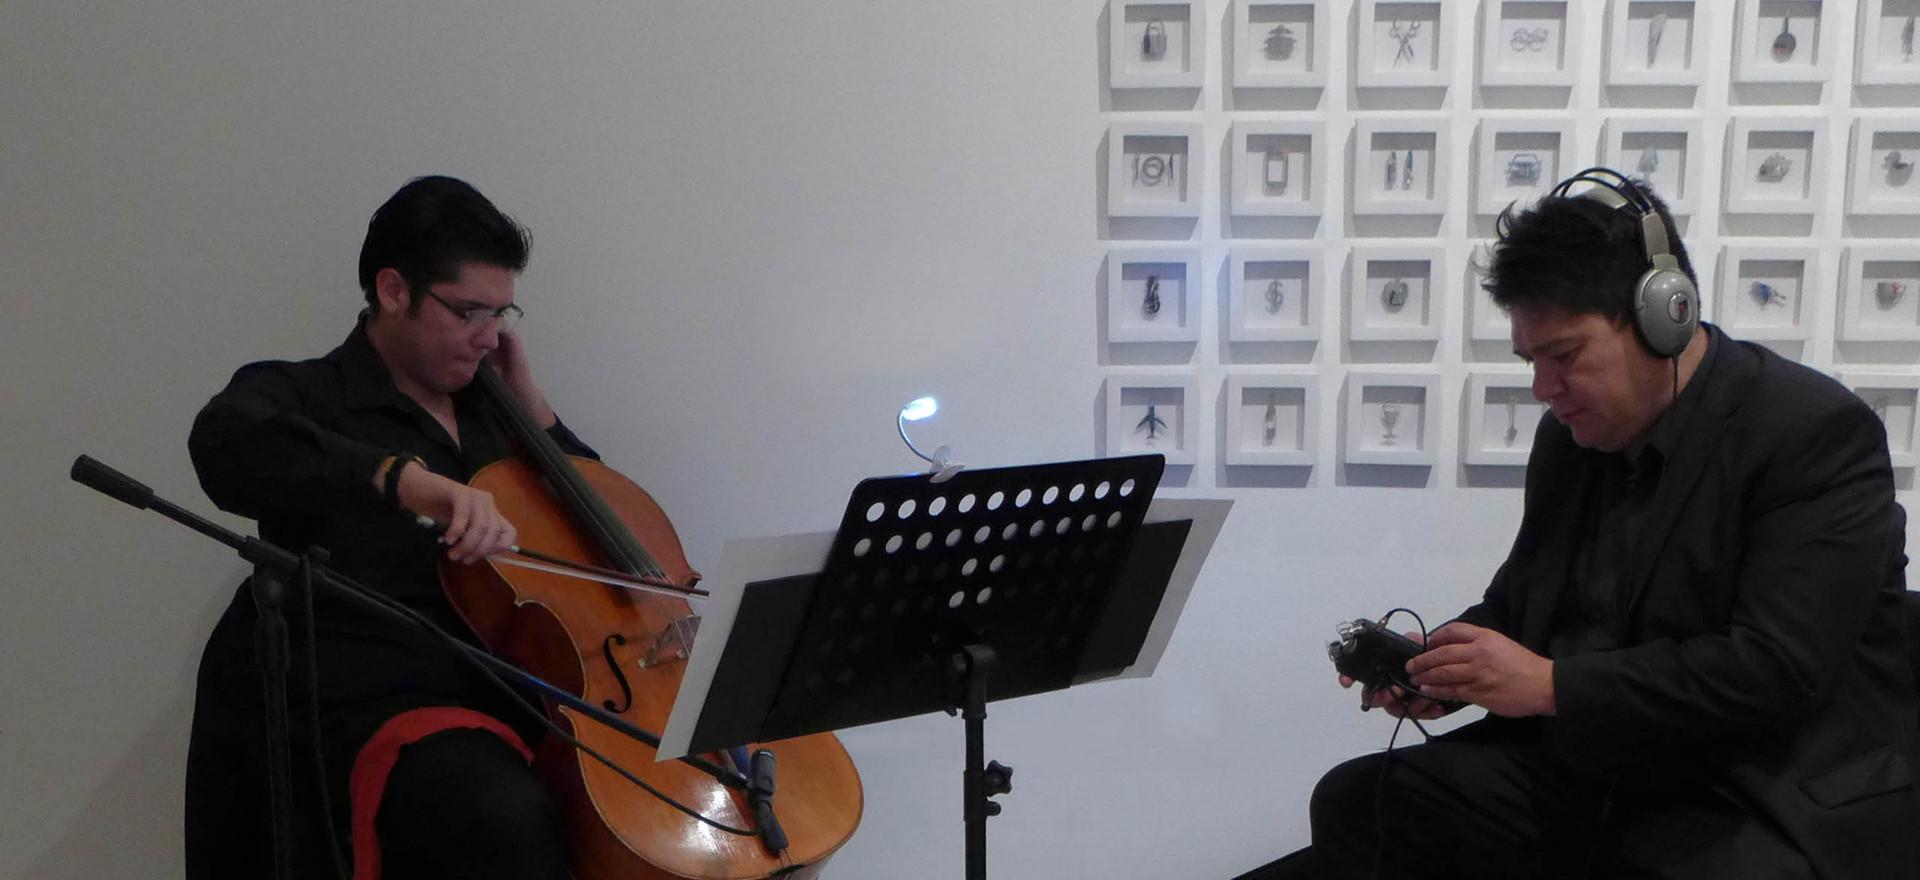 Fate, 2017. Multidisciplinary performance. Violonchelist Miguel Angel Villeda Cerón and composer Venus Rey, Jr.